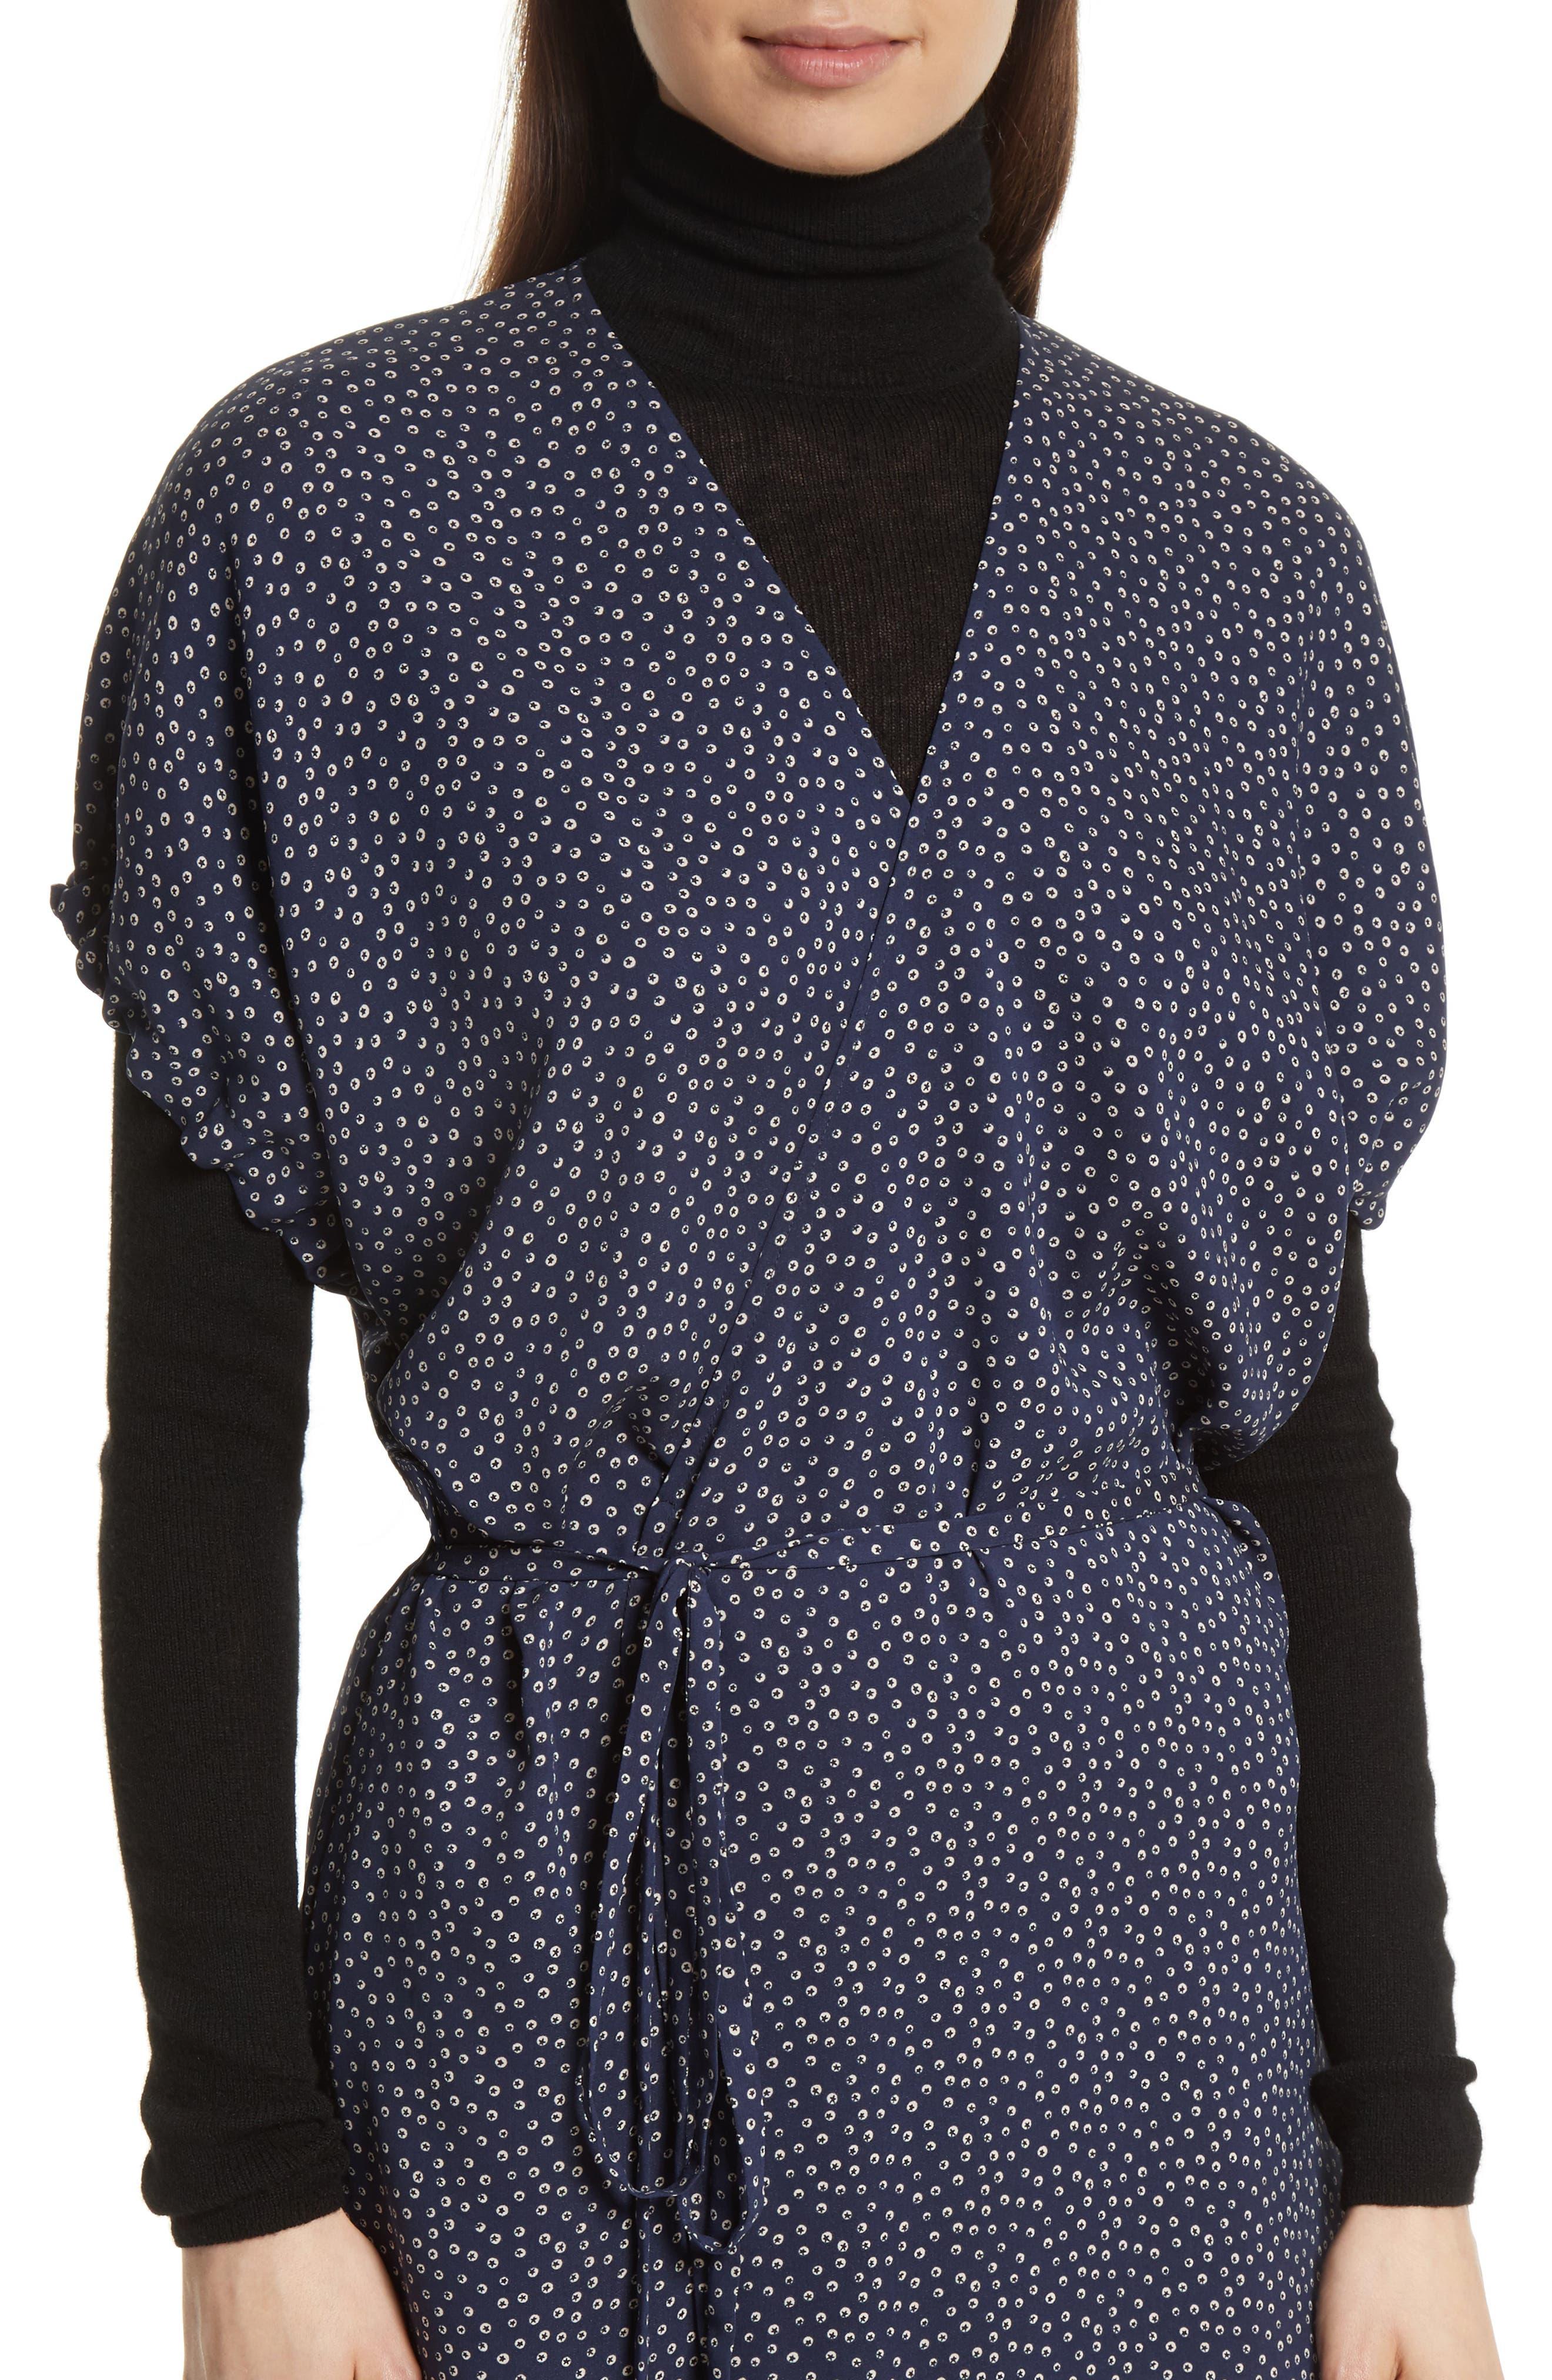 Celestial Polka Dot Kimono Wrap Dress,                             Alternate thumbnail 4, color,                             415